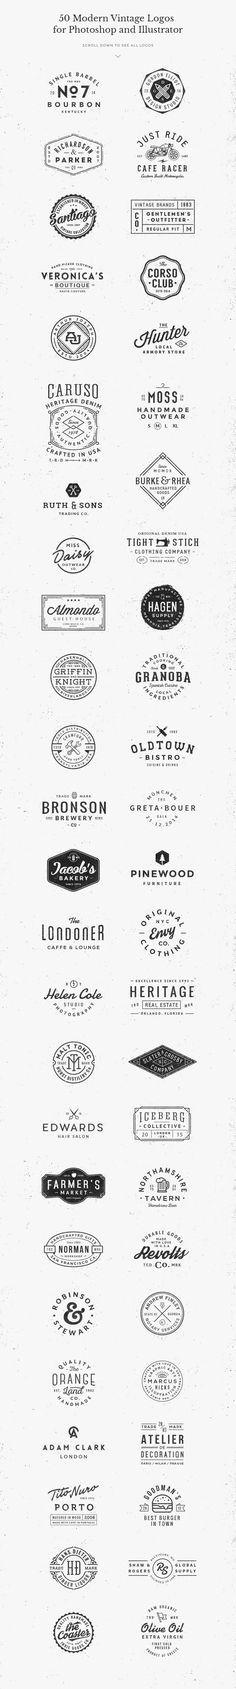 #candidatos http://jrstudioweb.com/diseno-grafico/diseno-de-logotipos/